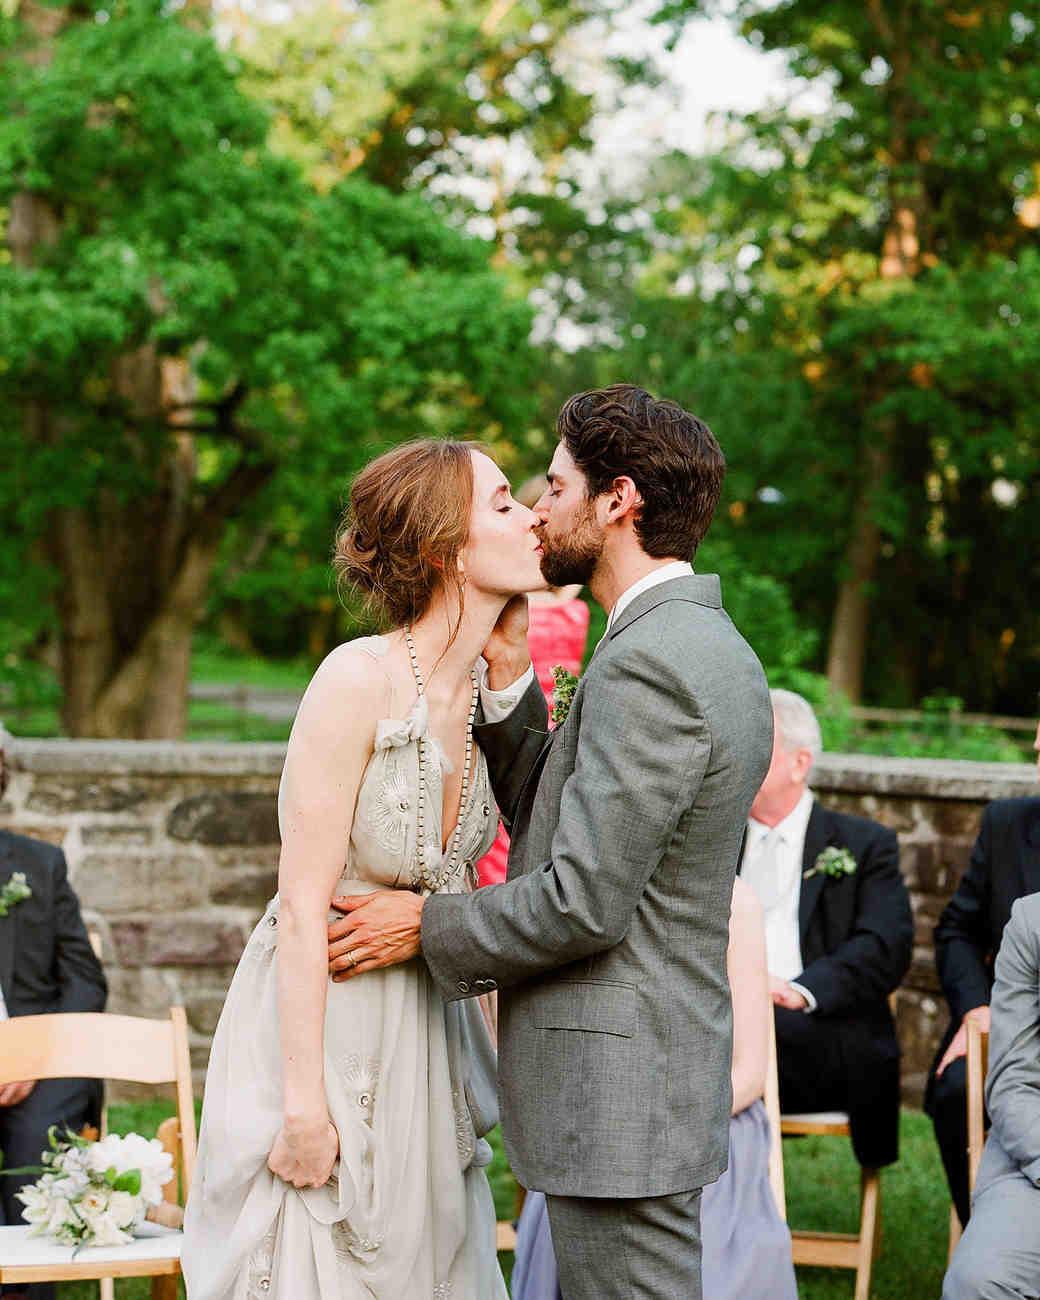 rw-stephanie-ben-kiss.jpg